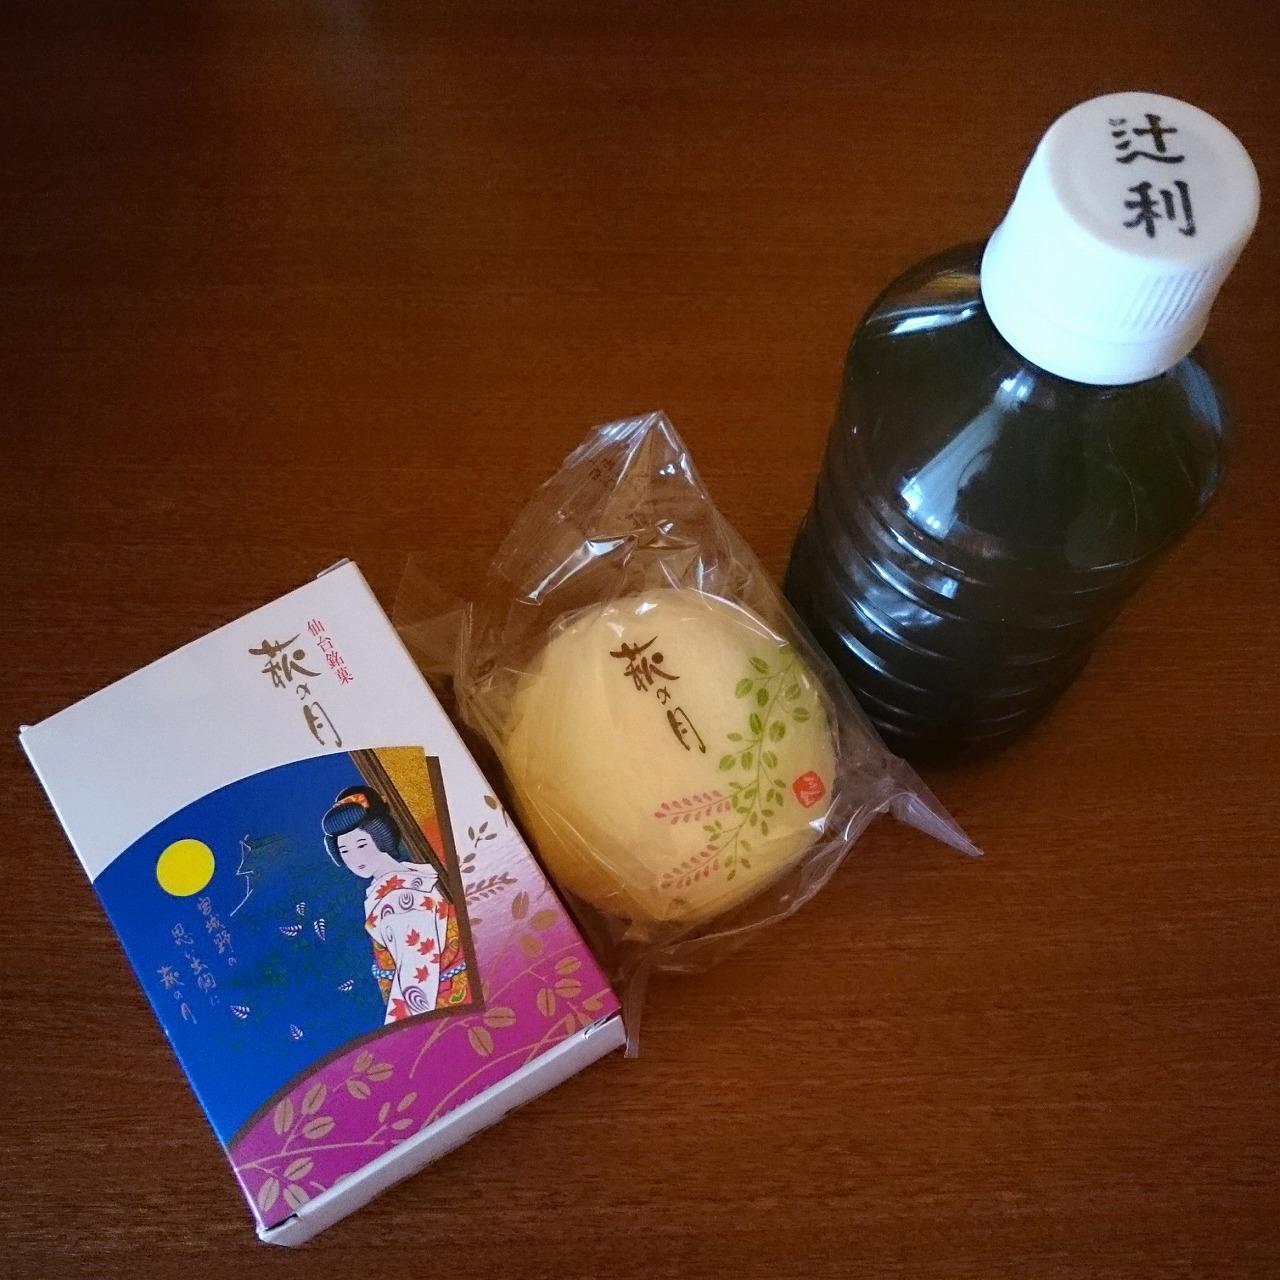 20150617-02_HagiNoTsuji_MeusLiquid.jpg